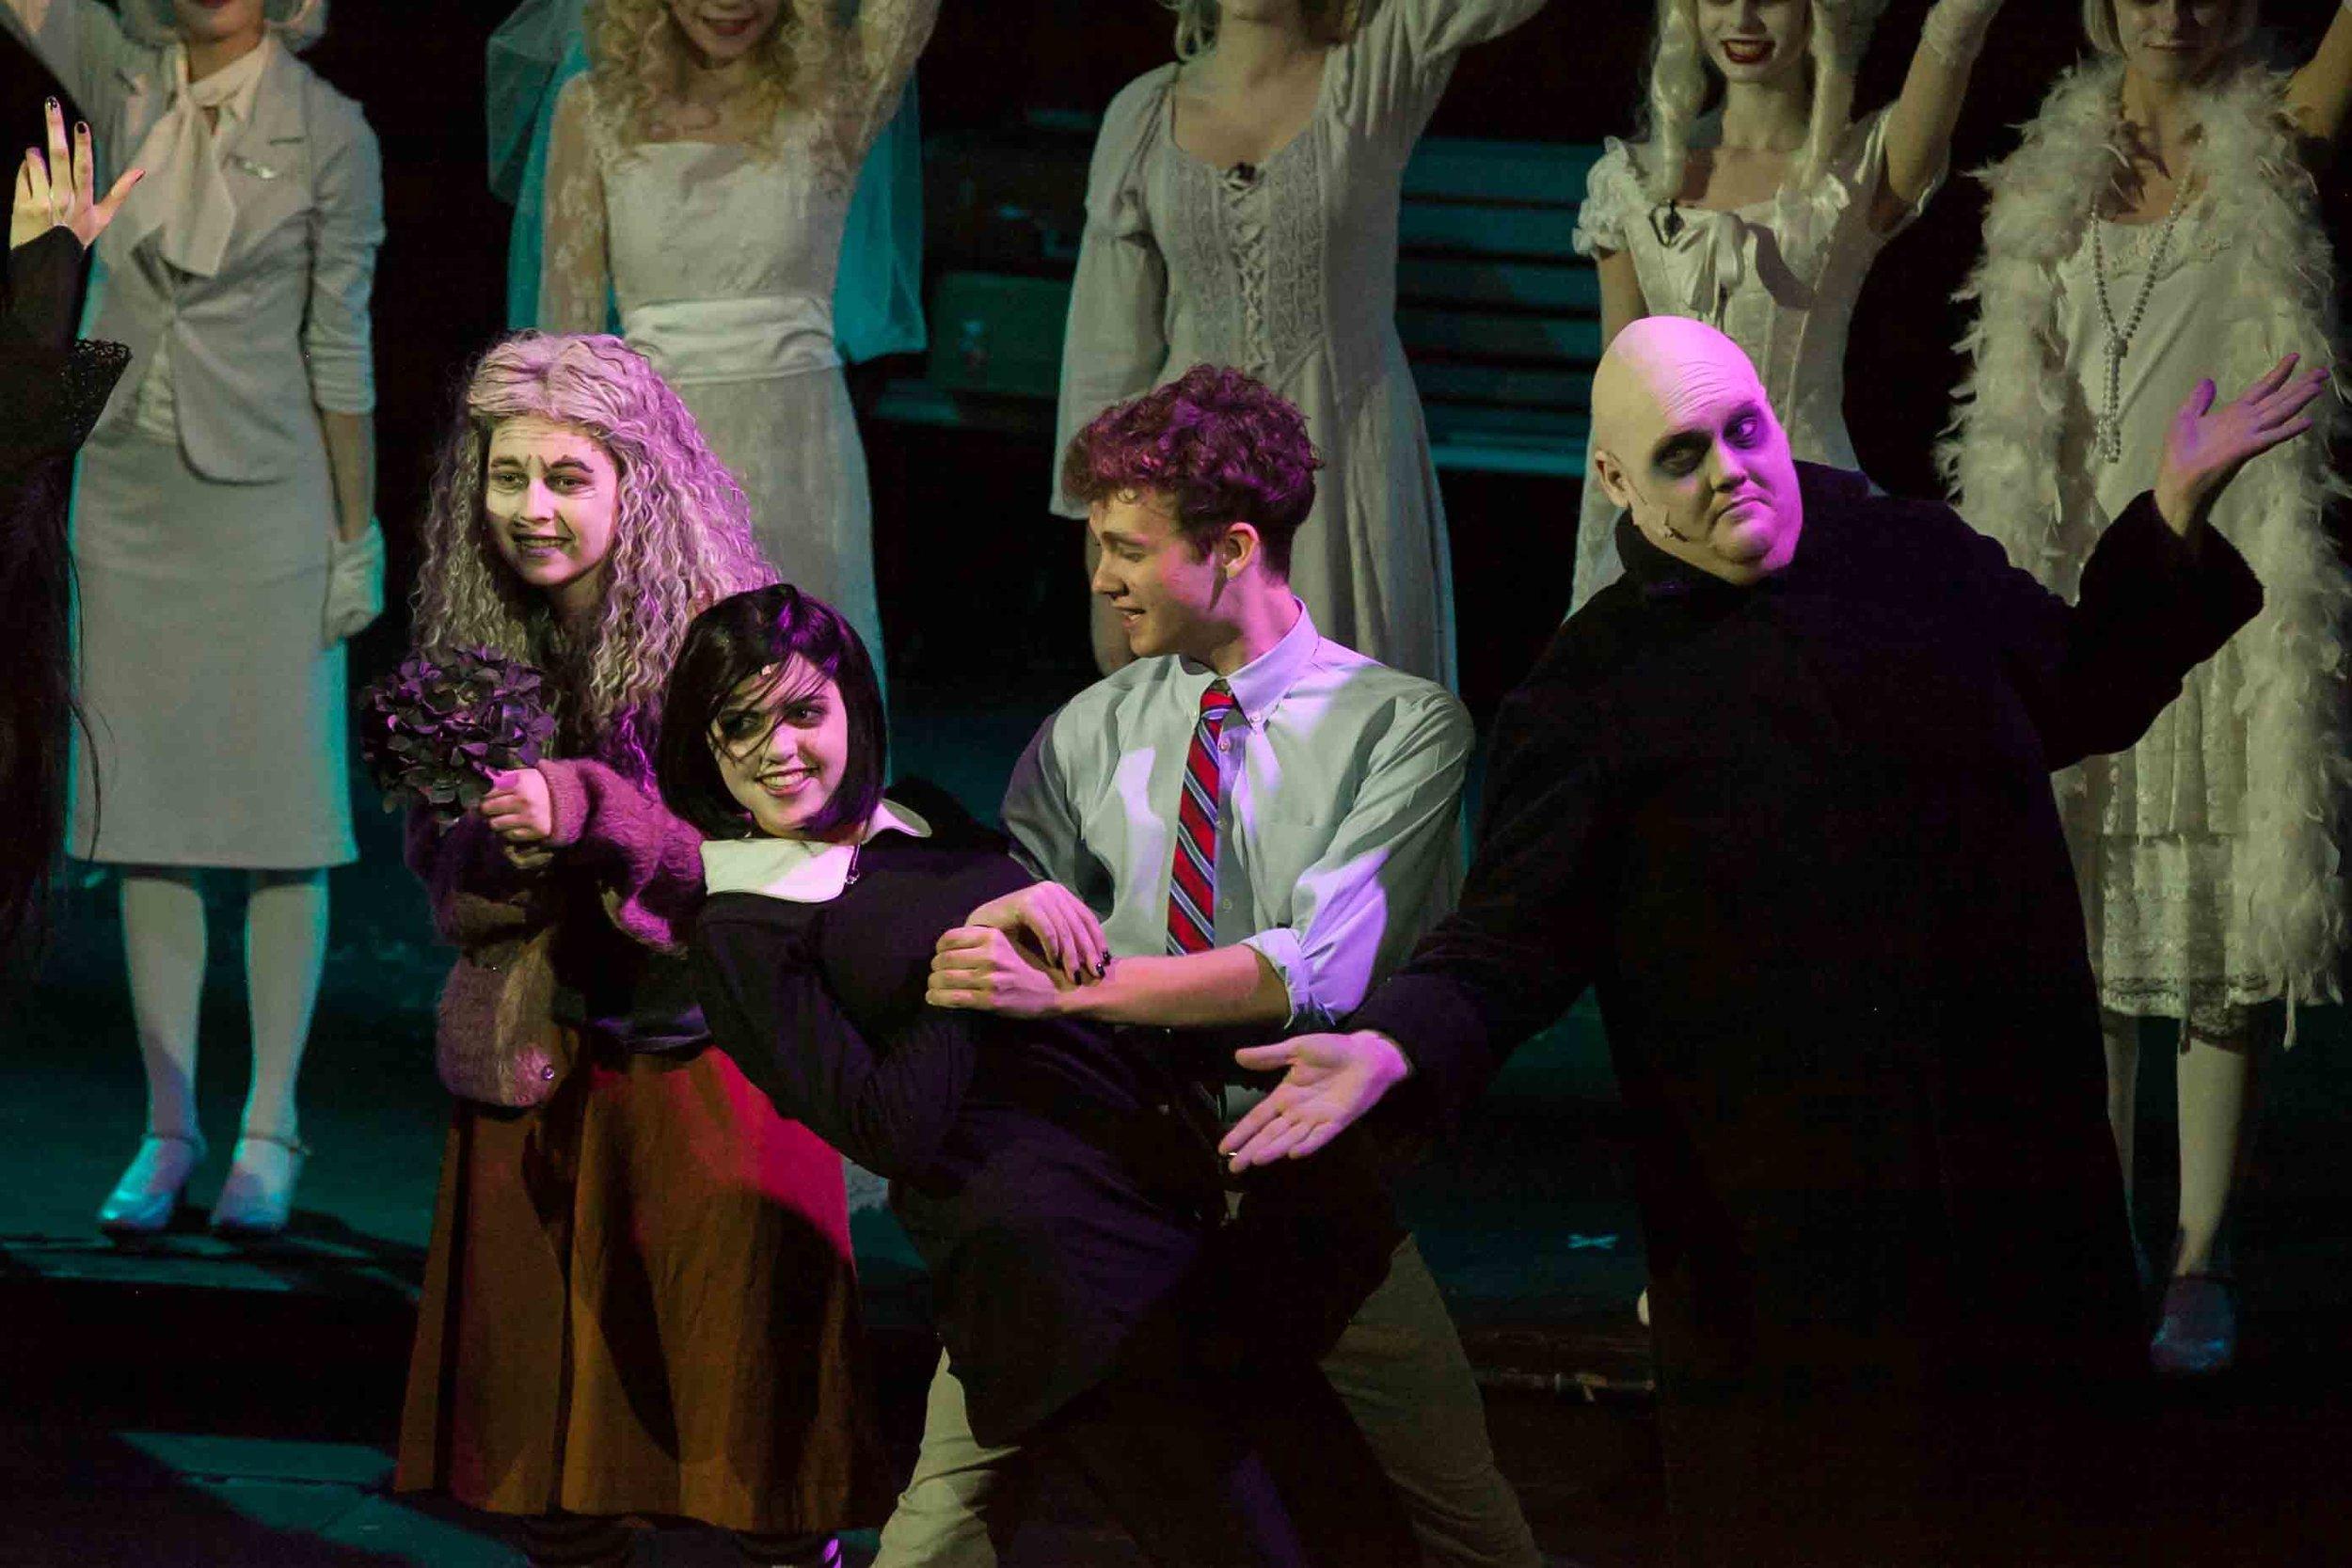 6-19-16 Addams Family Kooky Cast 0456.jpg